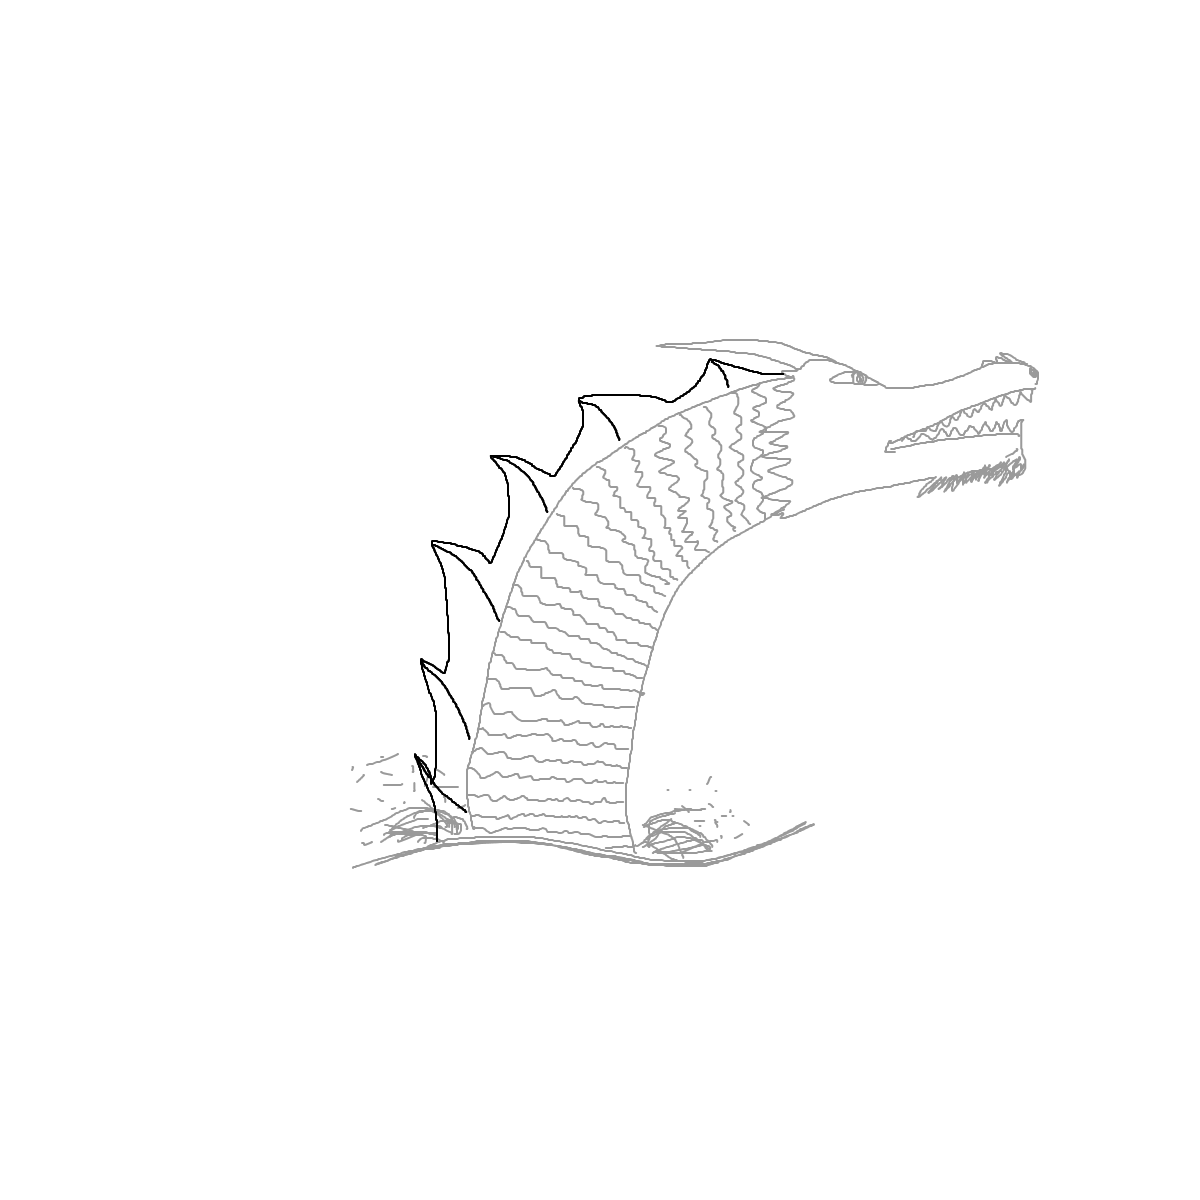 BAAAM drawing#2261 lat:43.4005393981933600lng: -1.7704249620437622